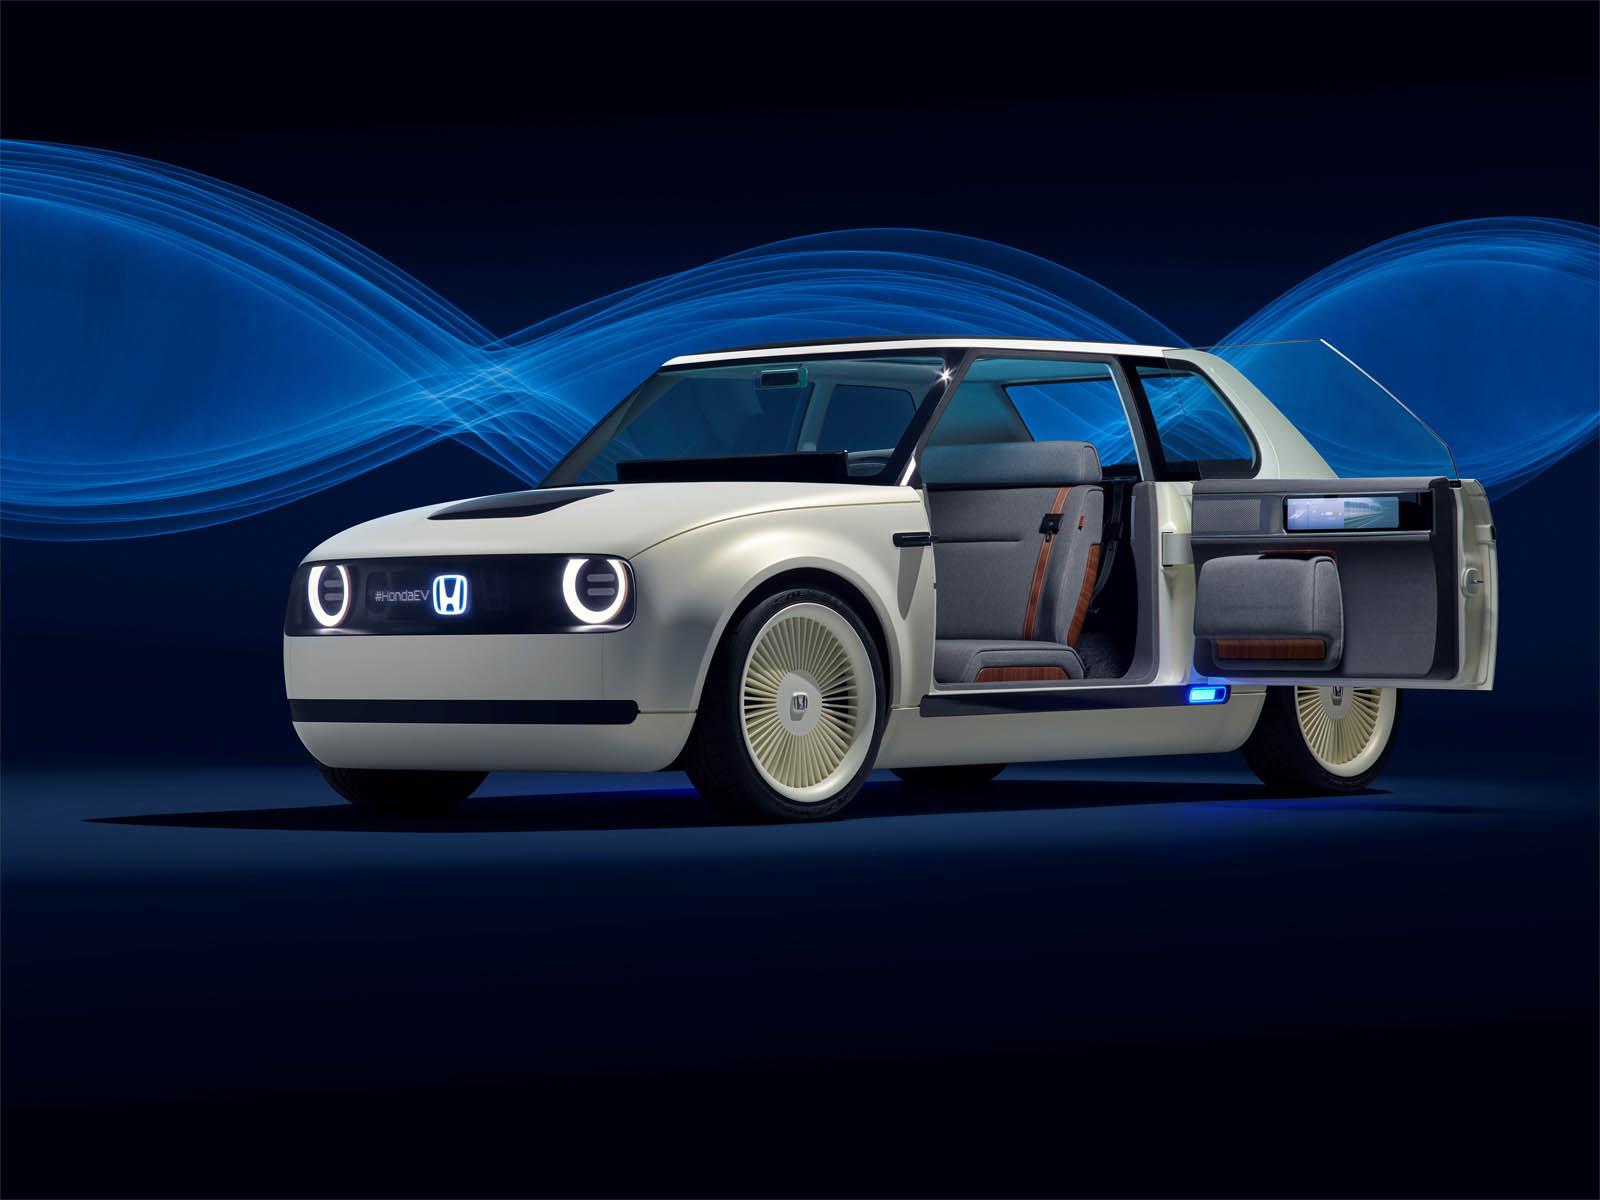 113865_Honda_Urban_EV_Concept_unveiled_at_the_Frankfurt_Motor_Show%2Bcopy.jpg